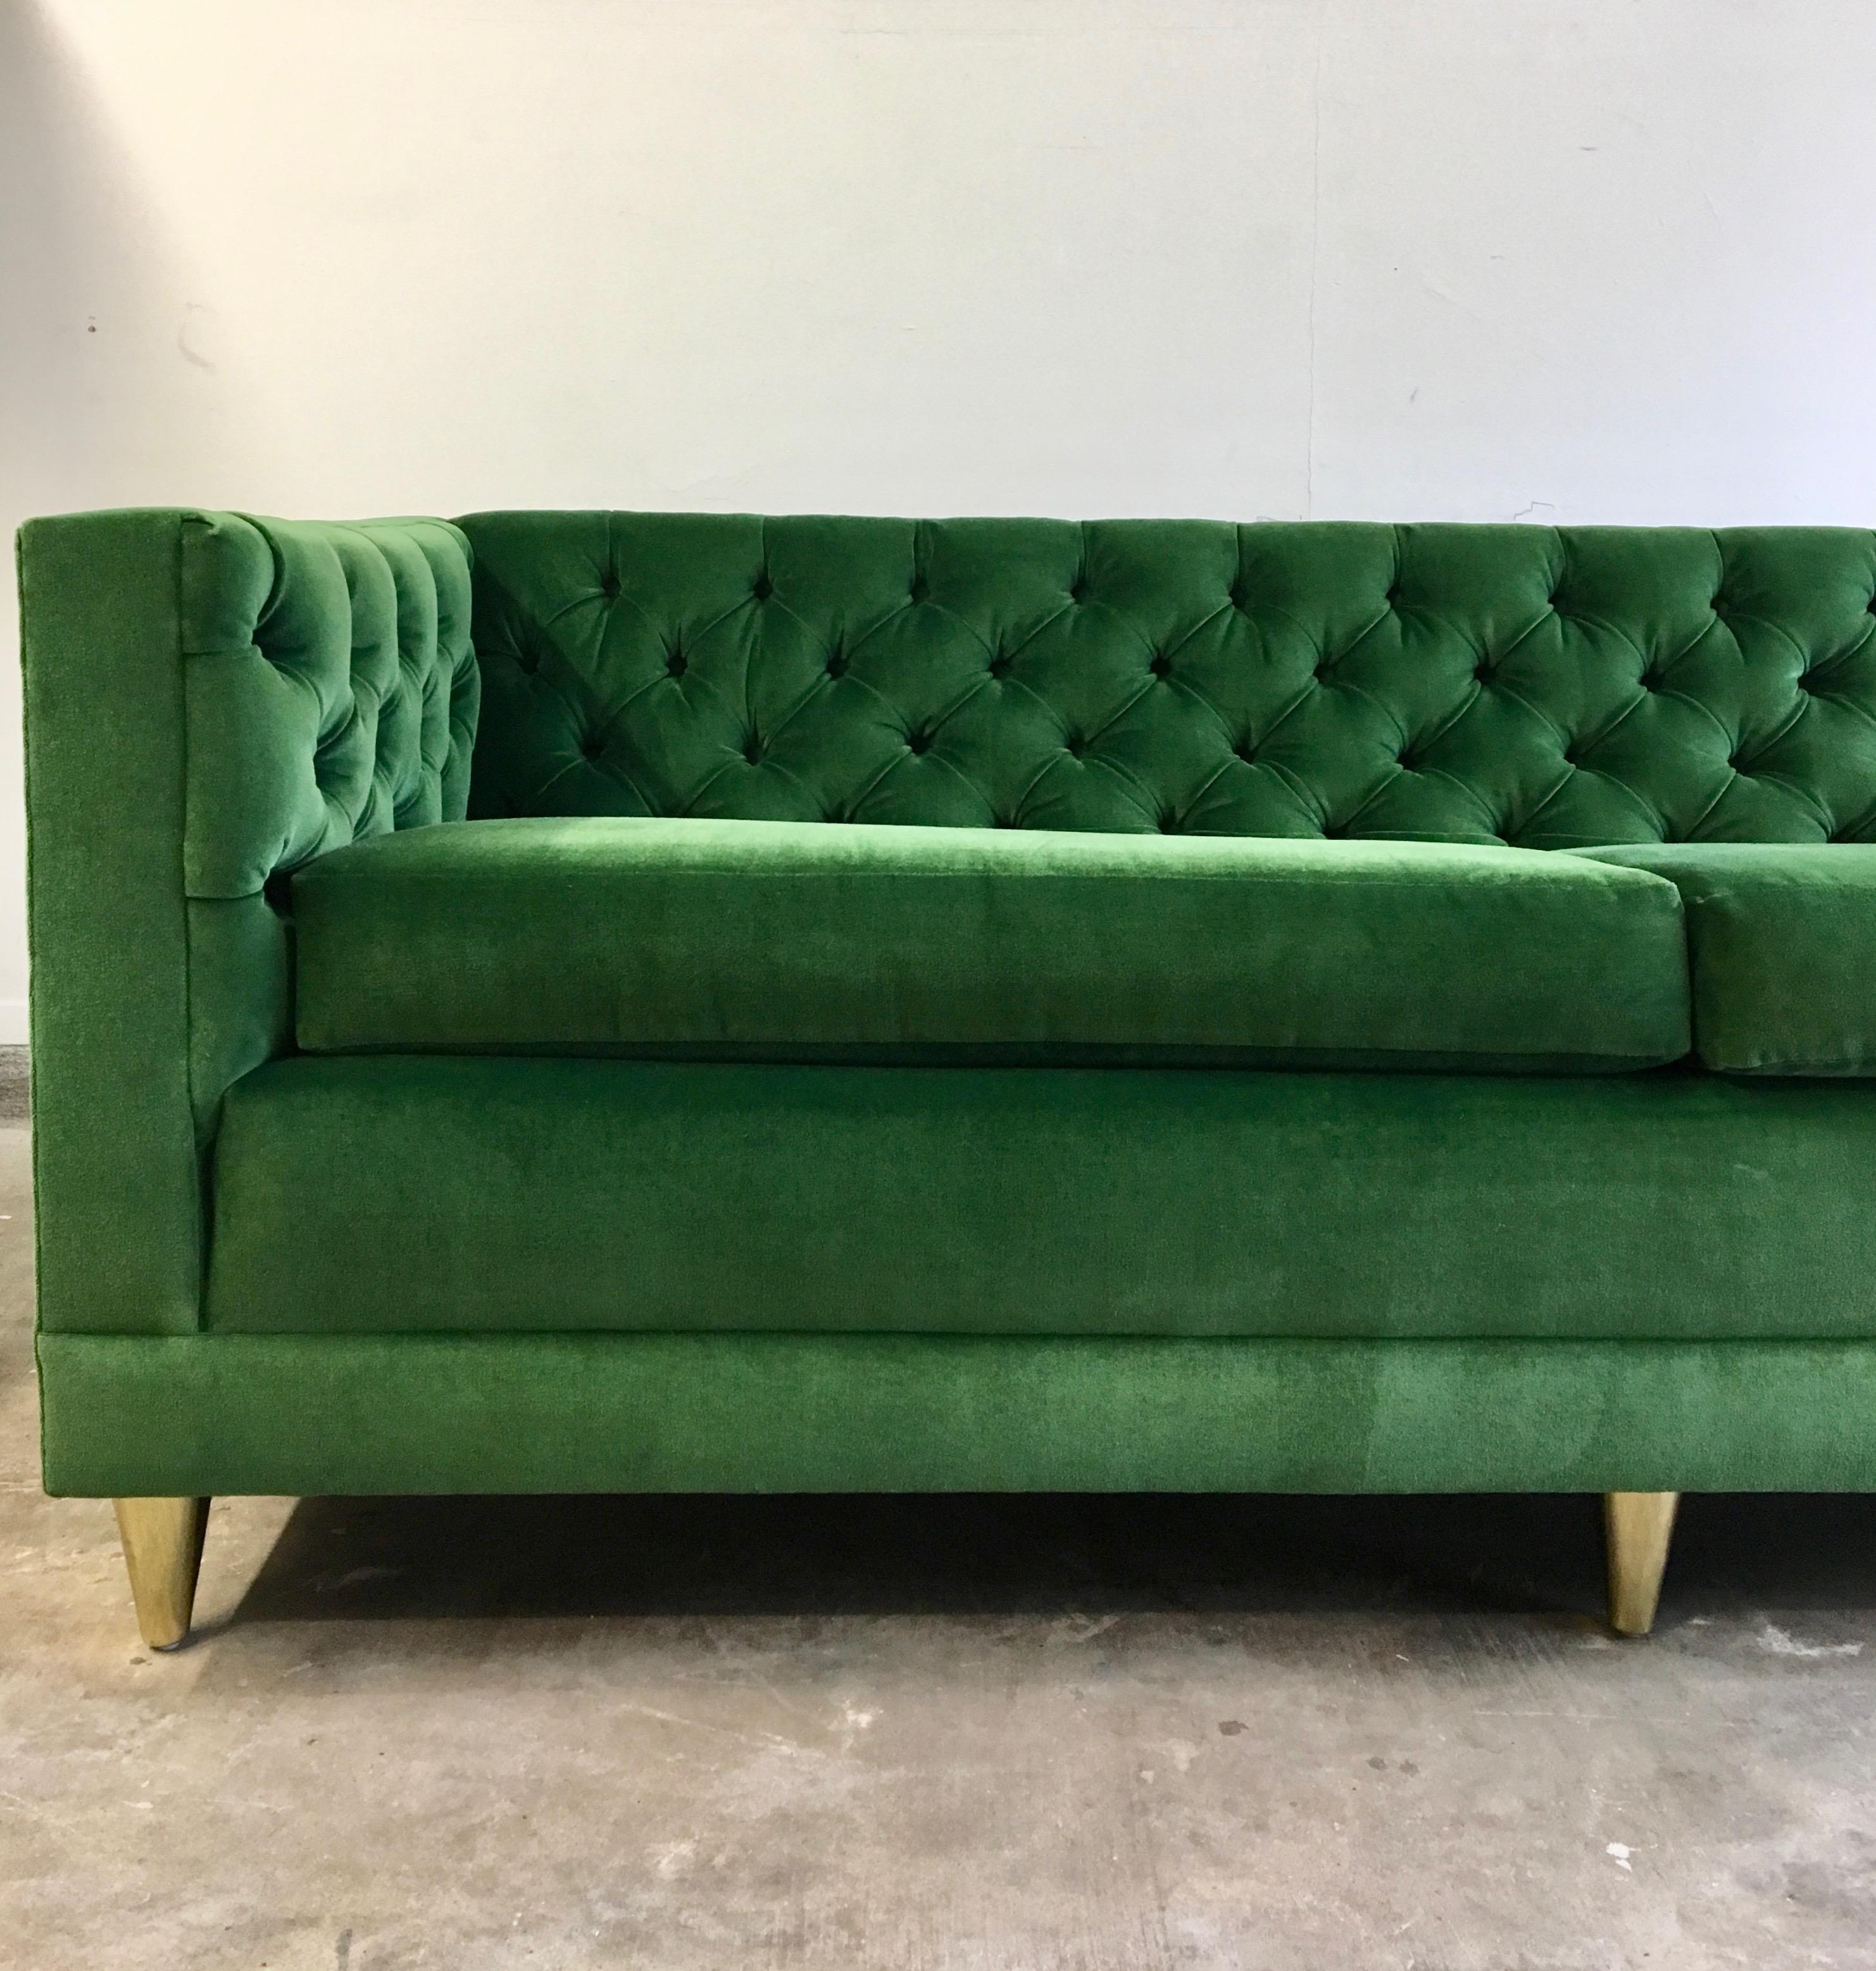 Green Velvet Tuxedo Sofa Image Of With Tuxedo Sofa